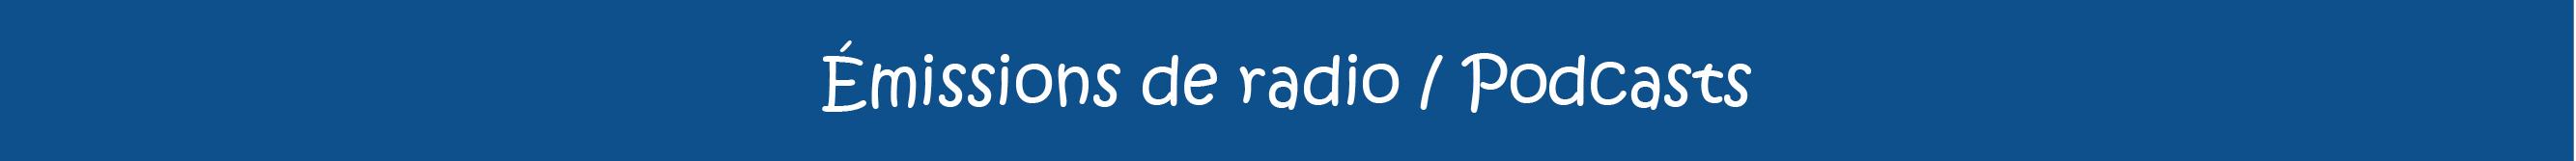 Bannière-emissionsradio